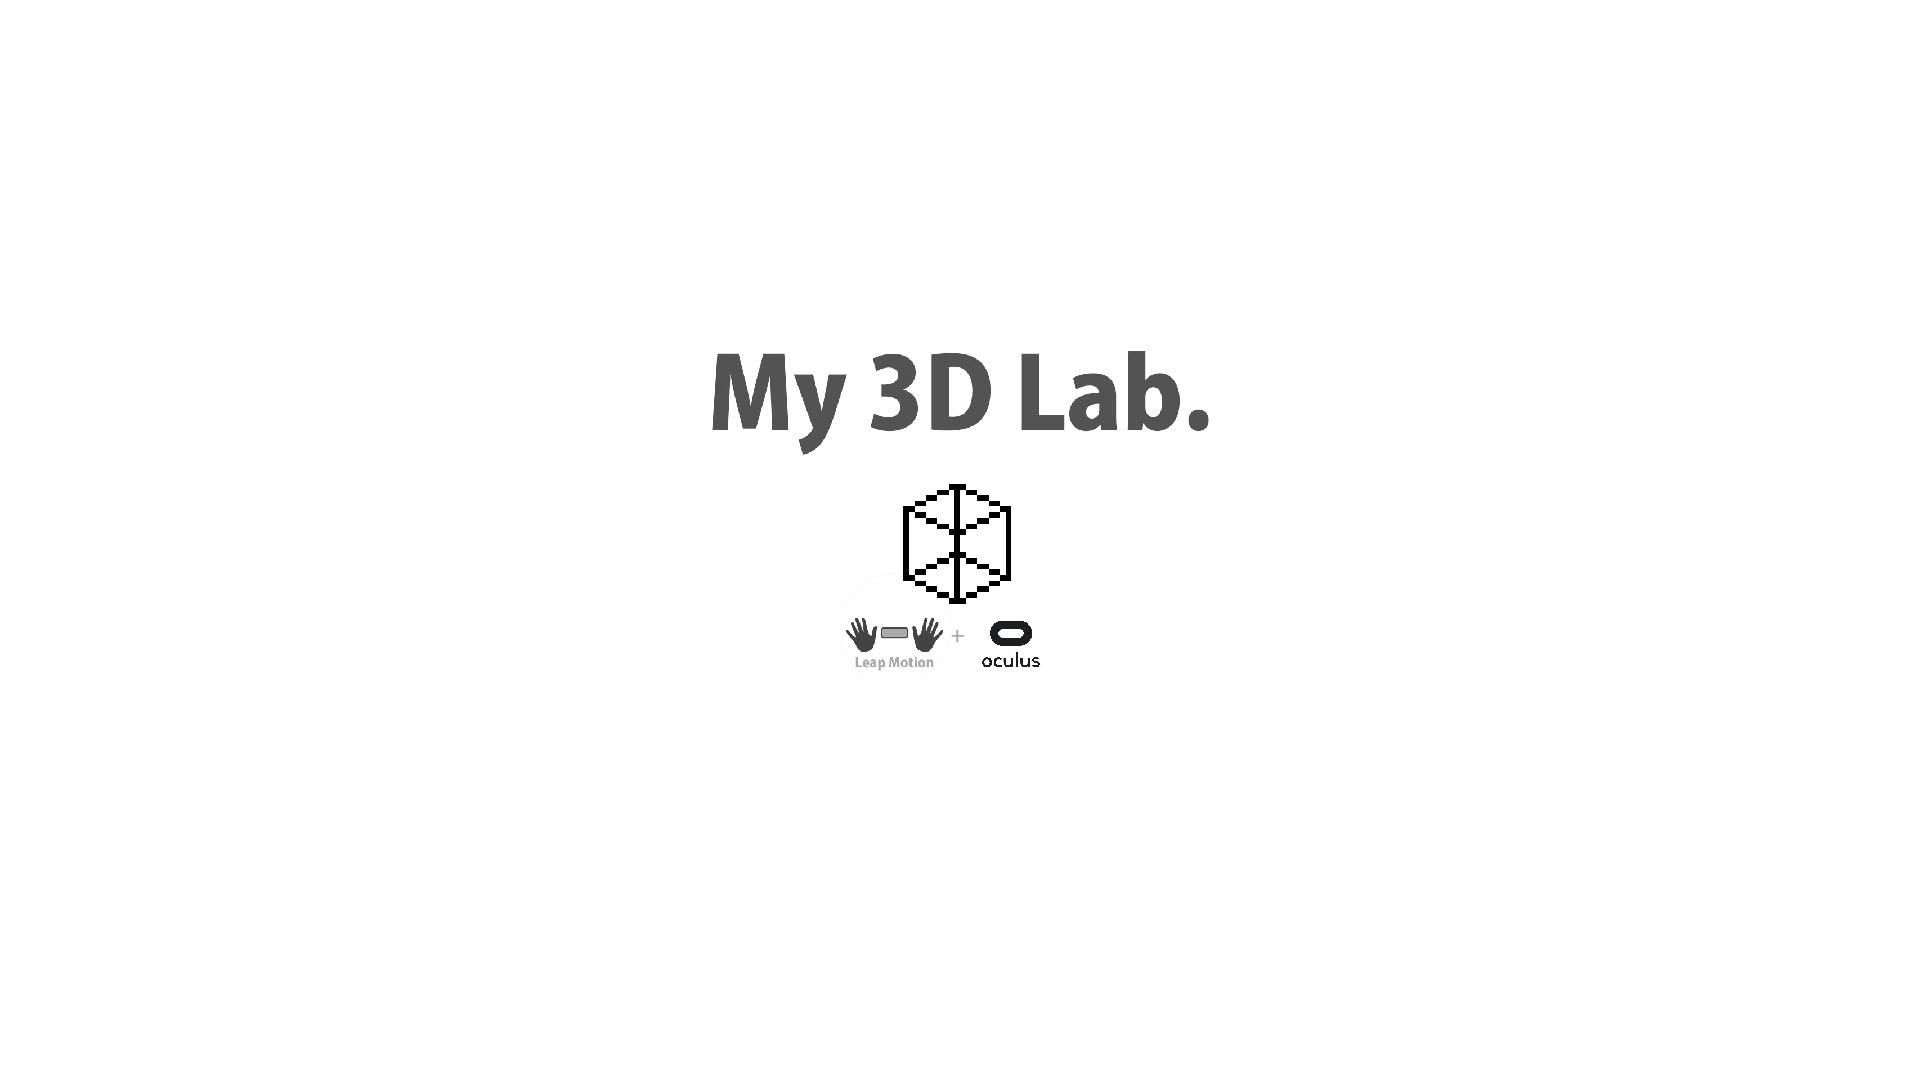 My 3D Lab